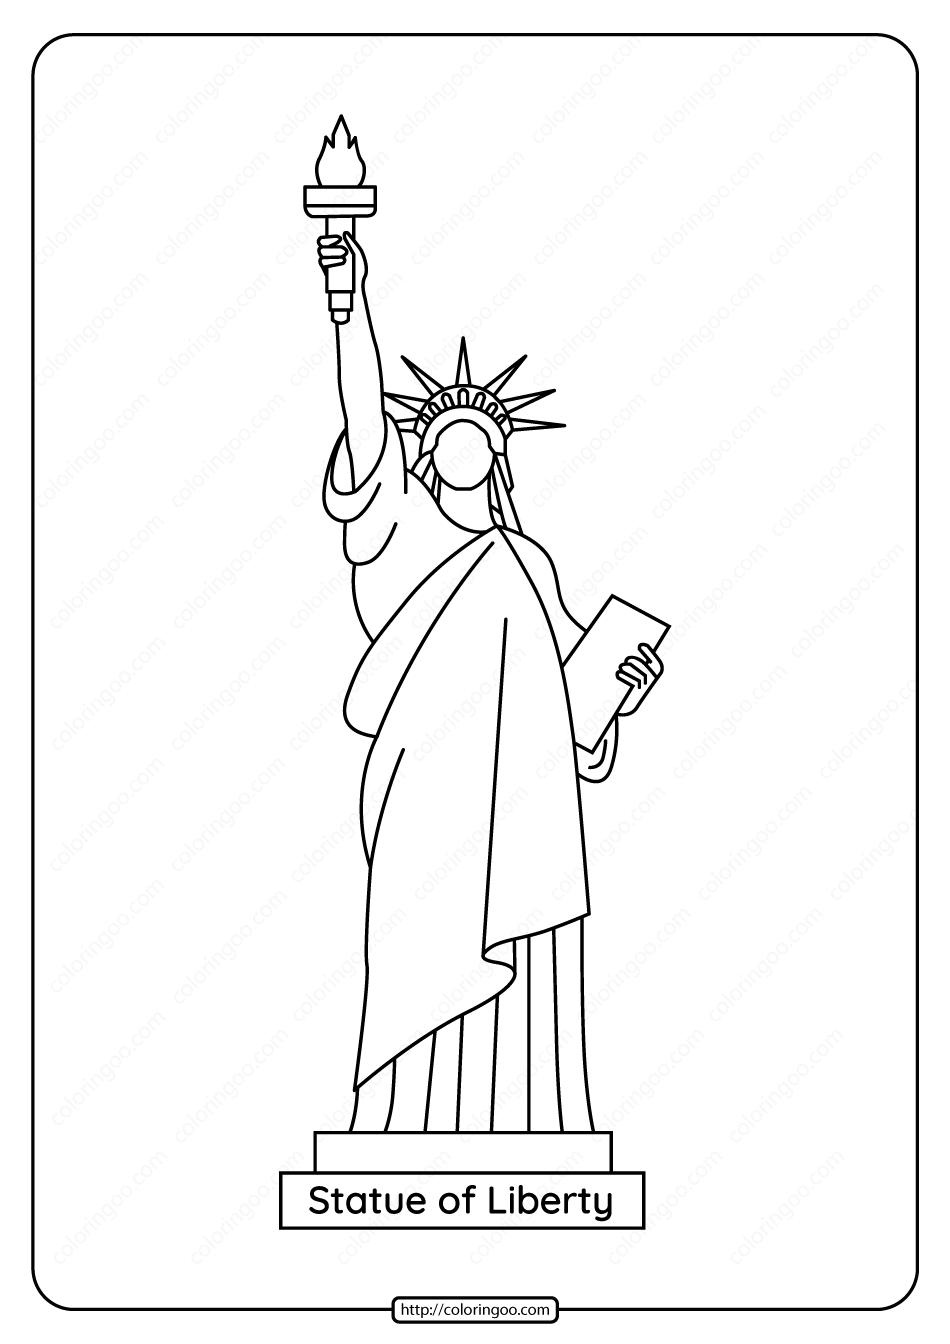 Free Printable Statue Of Liberty Pdf Coloring Page Statue Of Liberty Drawing Statue Of Liberty Nyc Drawing